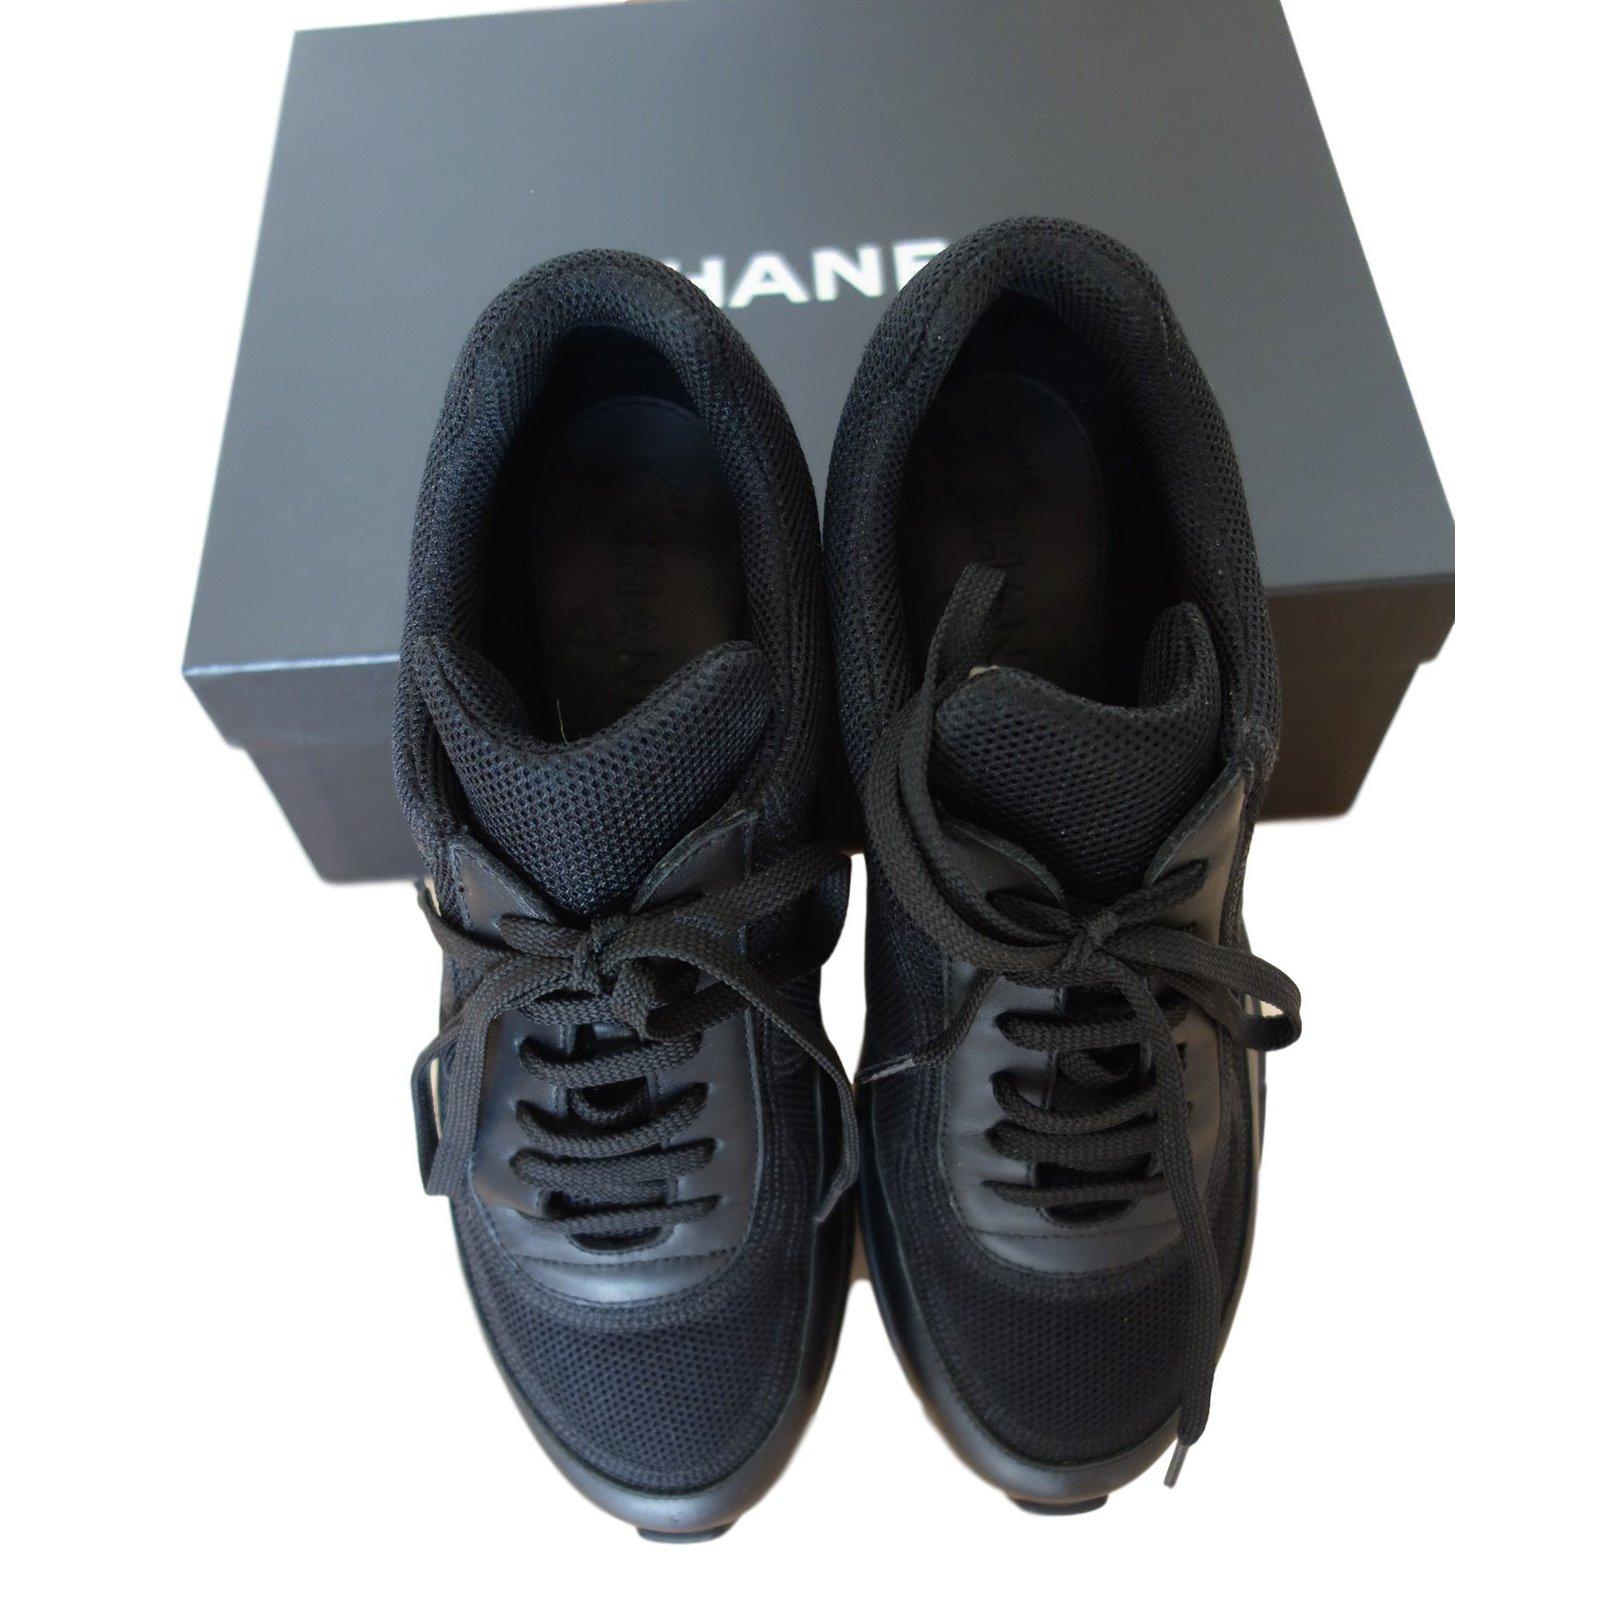 baskets chanel sneaker cuir et tissu chanel noir 39 5 cuir noir joli closet. Black Bedroom Furniture Sets. Home Design Ideas